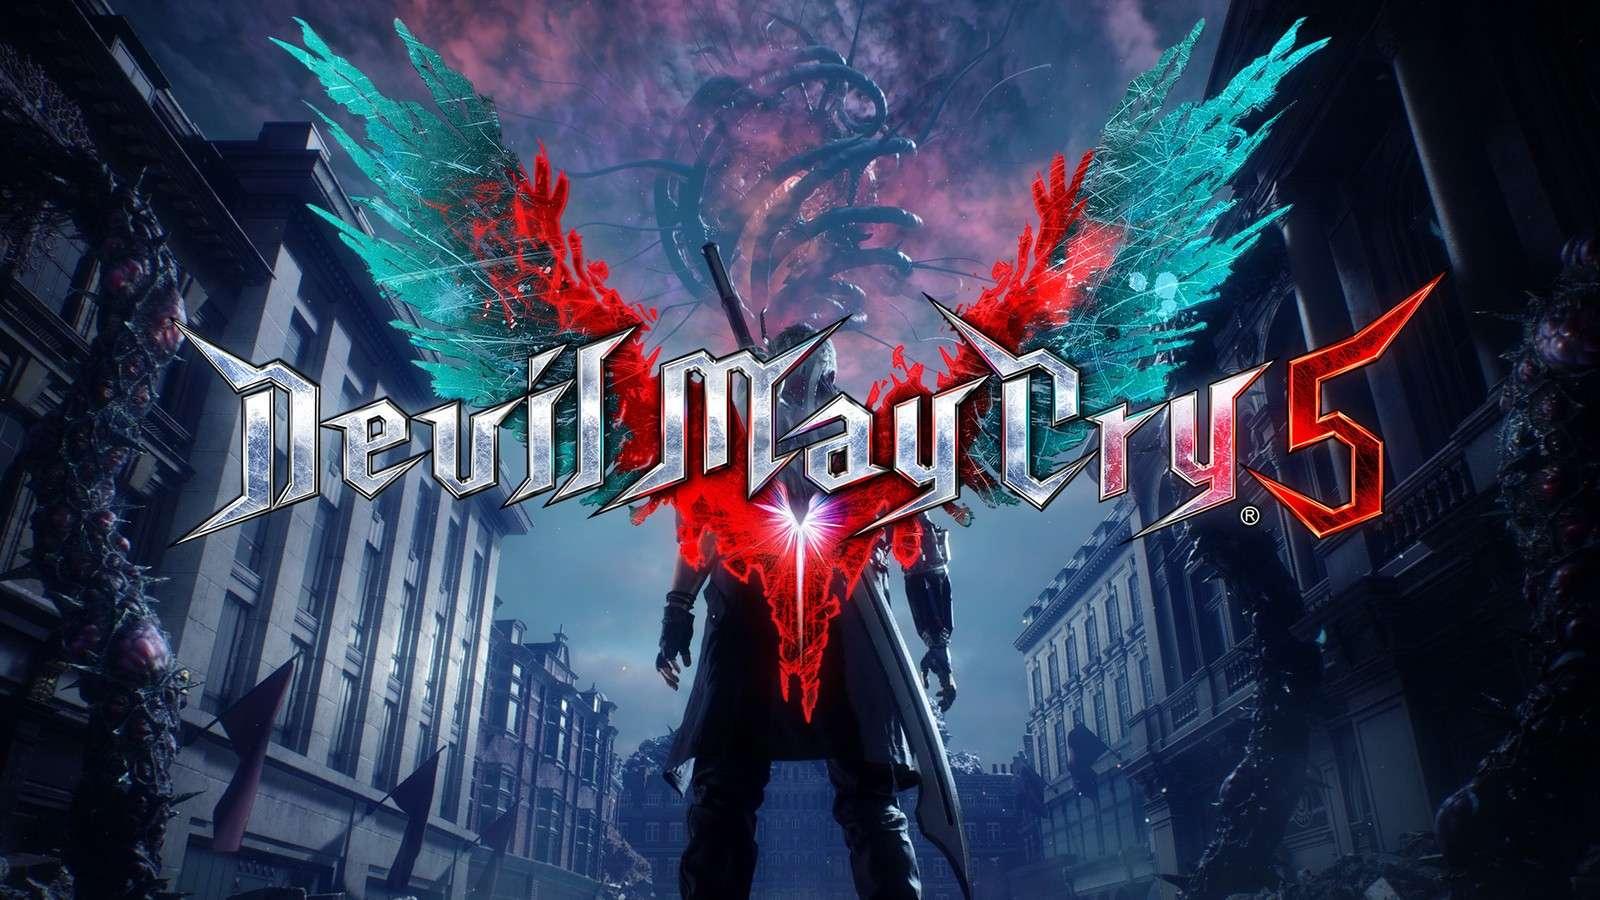 a07574c09d0fbeffb49bdc14fed25be3 - إشاعة: لعبة Devil May Cry 5 ستعود لخدمة Xbox Game Pass